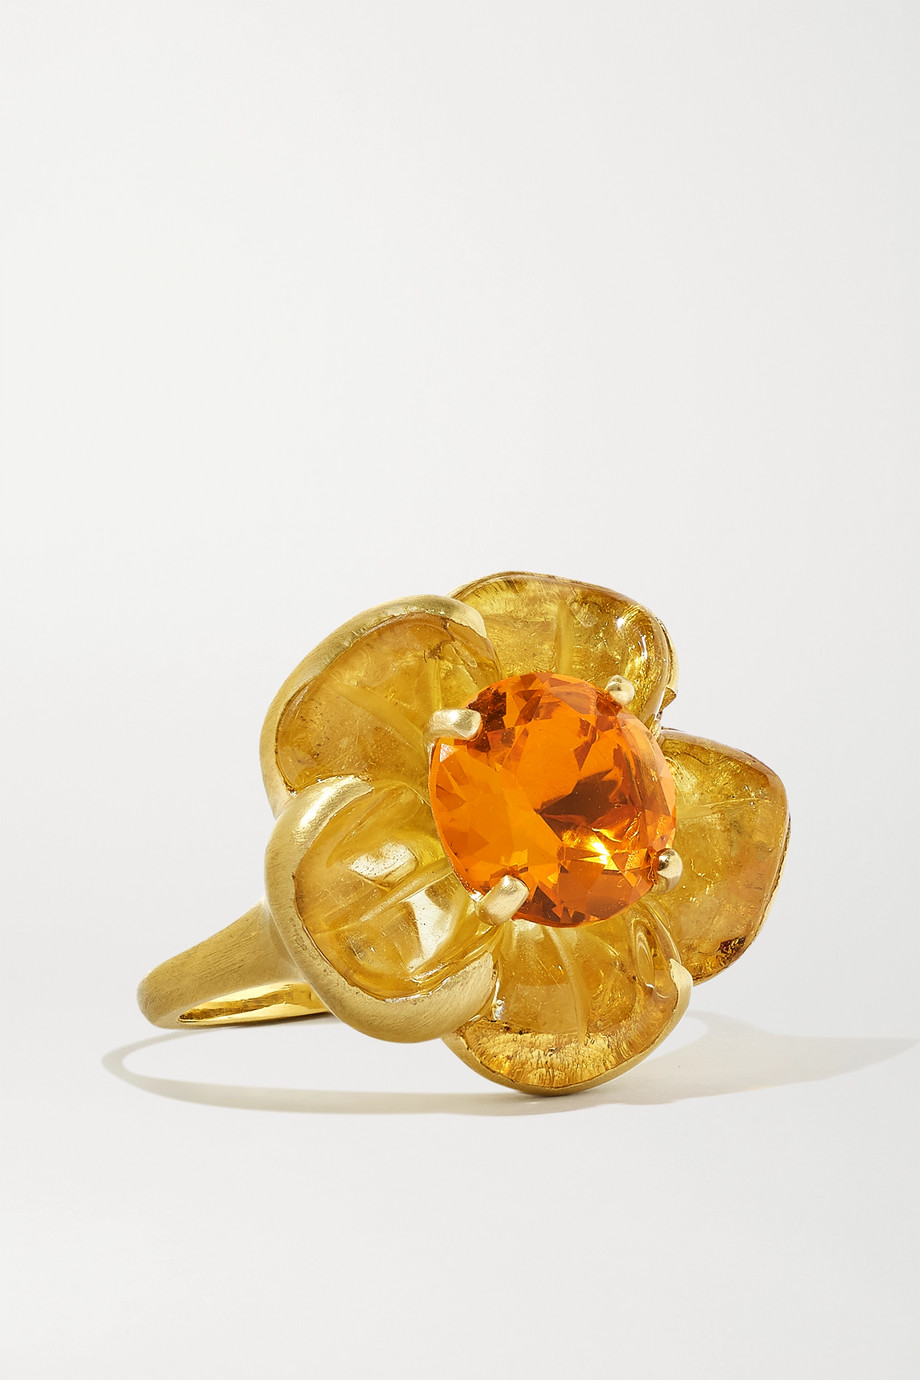 Irene Neuwirth Tropical Flower 18-karat gold, beryl and fire opal ring